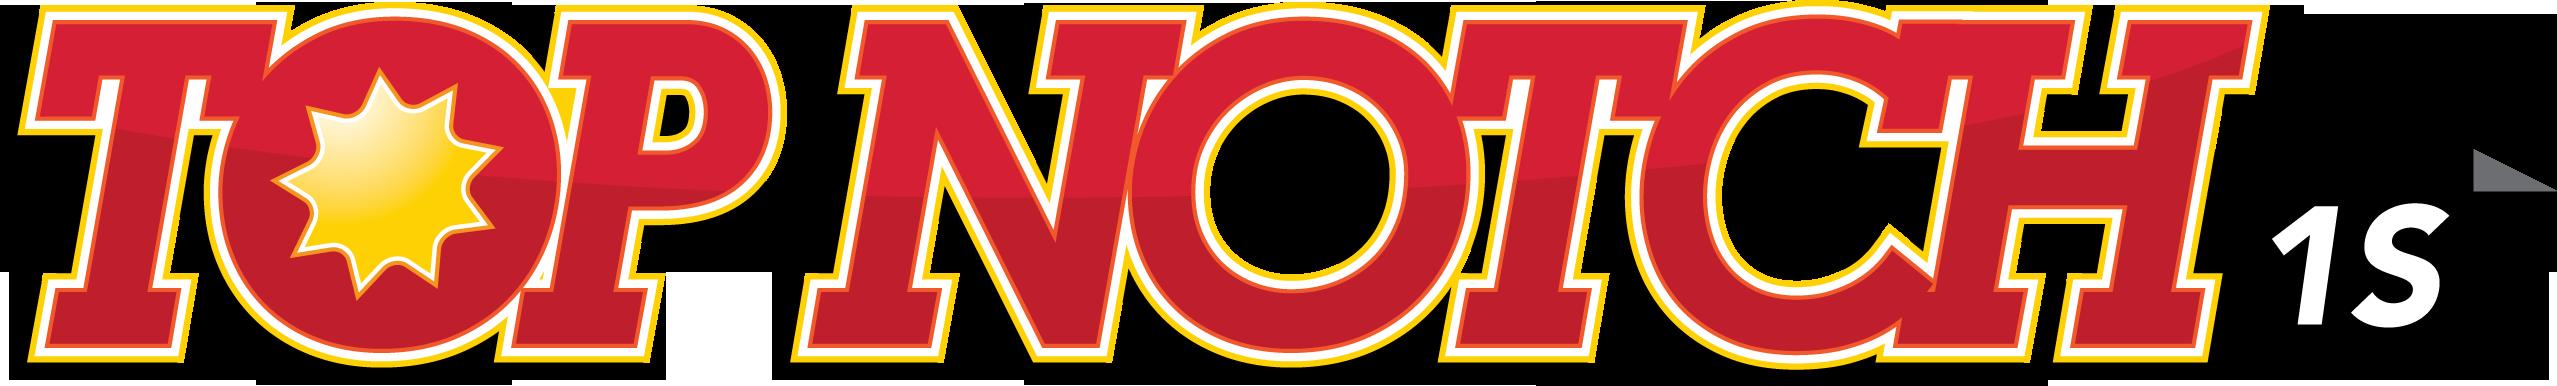 Top Notch 1S Logo